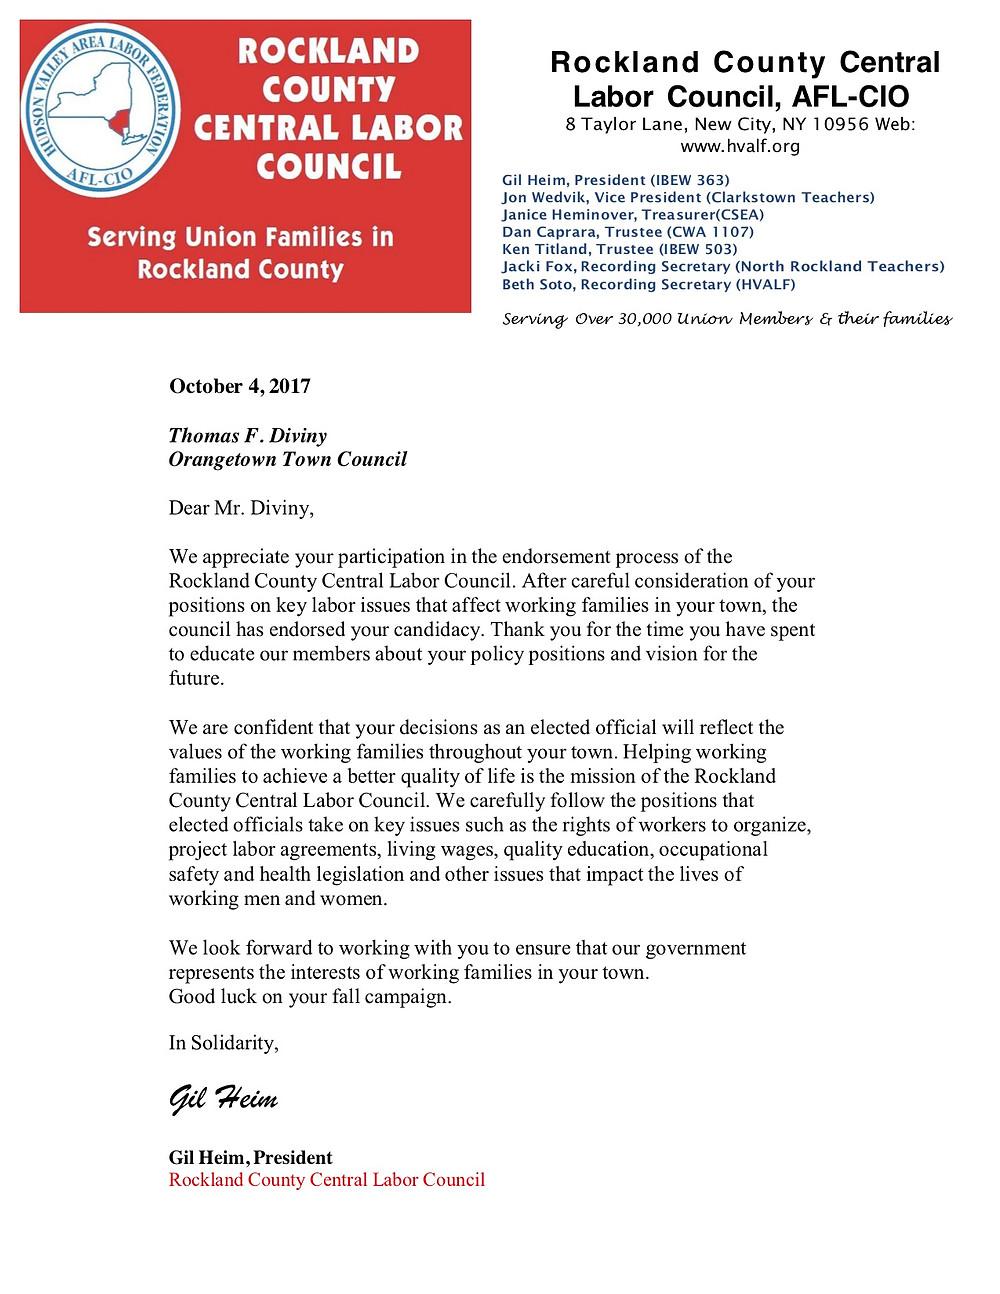 Rockland County Central Labor Council Endorses Tom Diviny